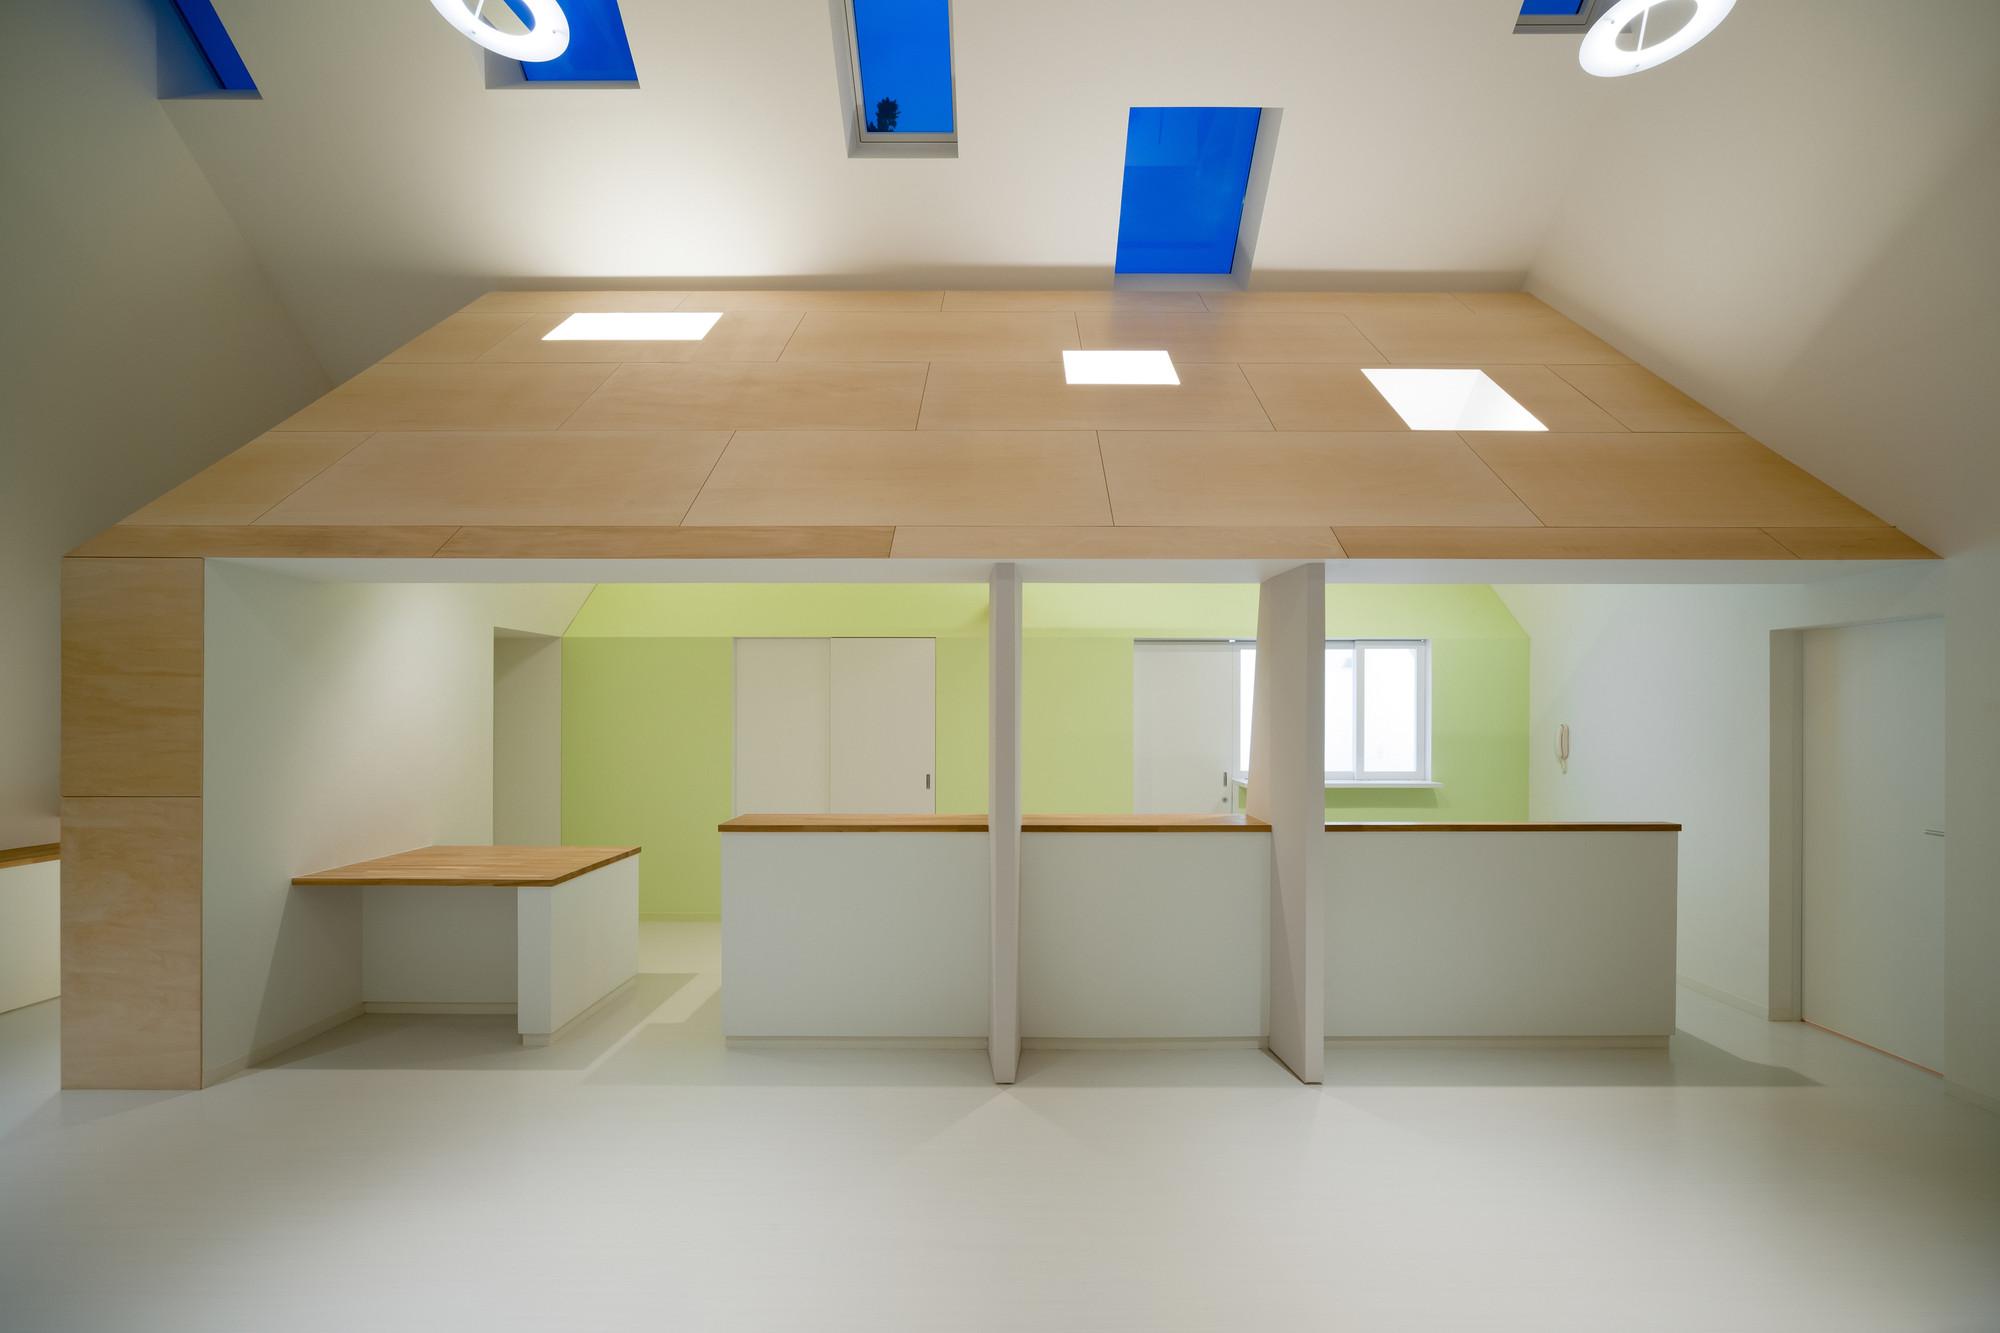 Kinubashi Pharmacy / Soeda and associates Architects, © Takumi Ota